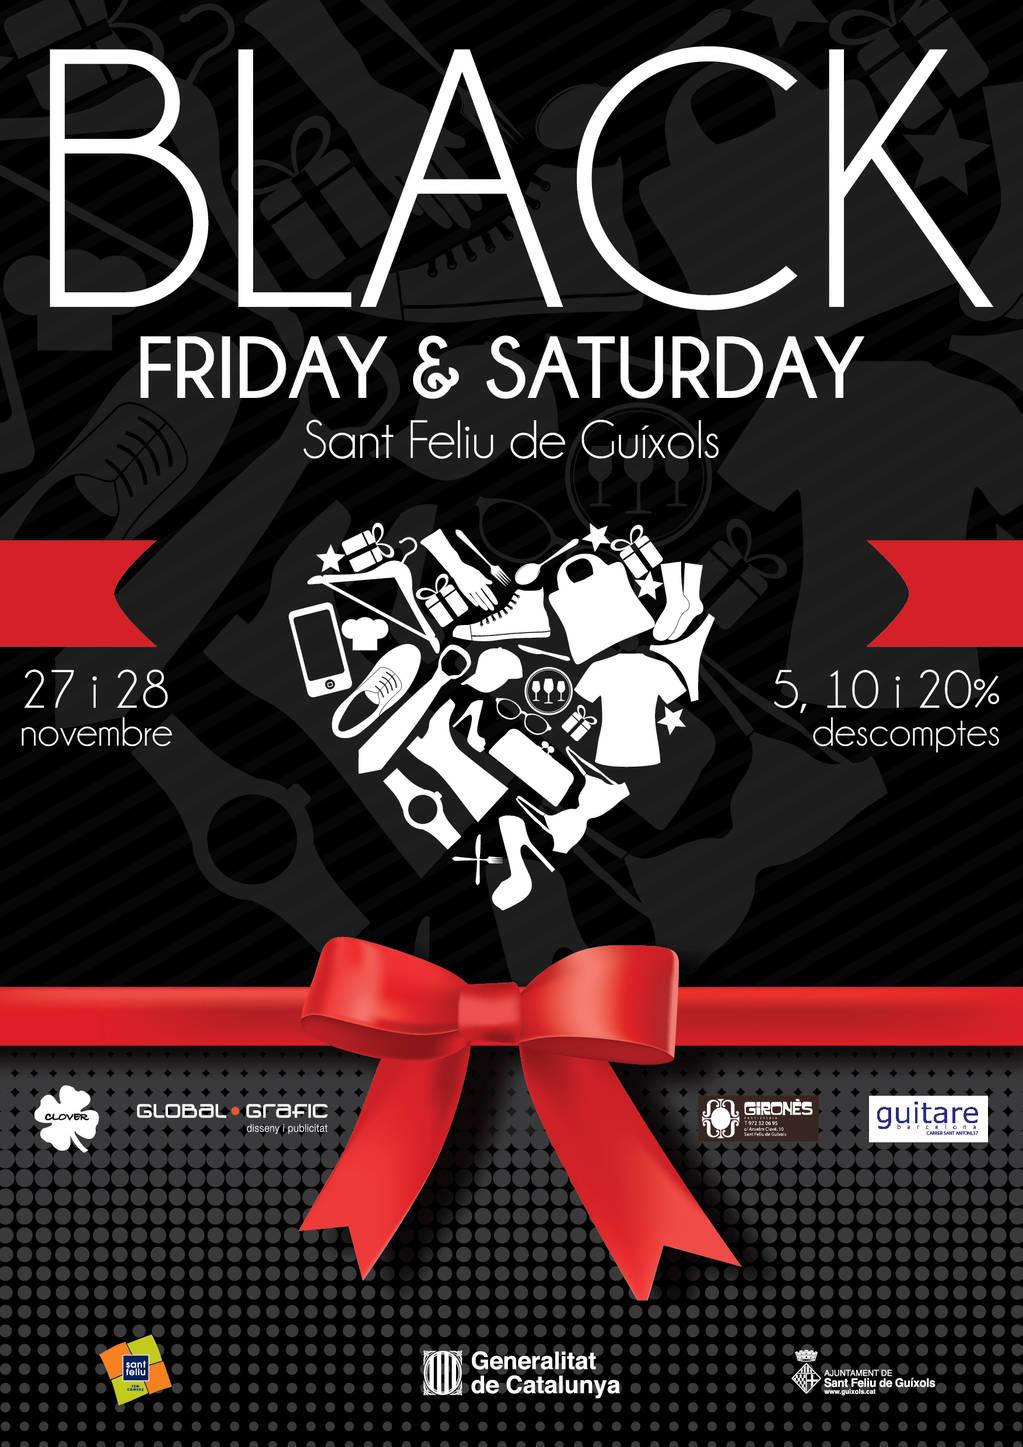 Black Friday & Saturday